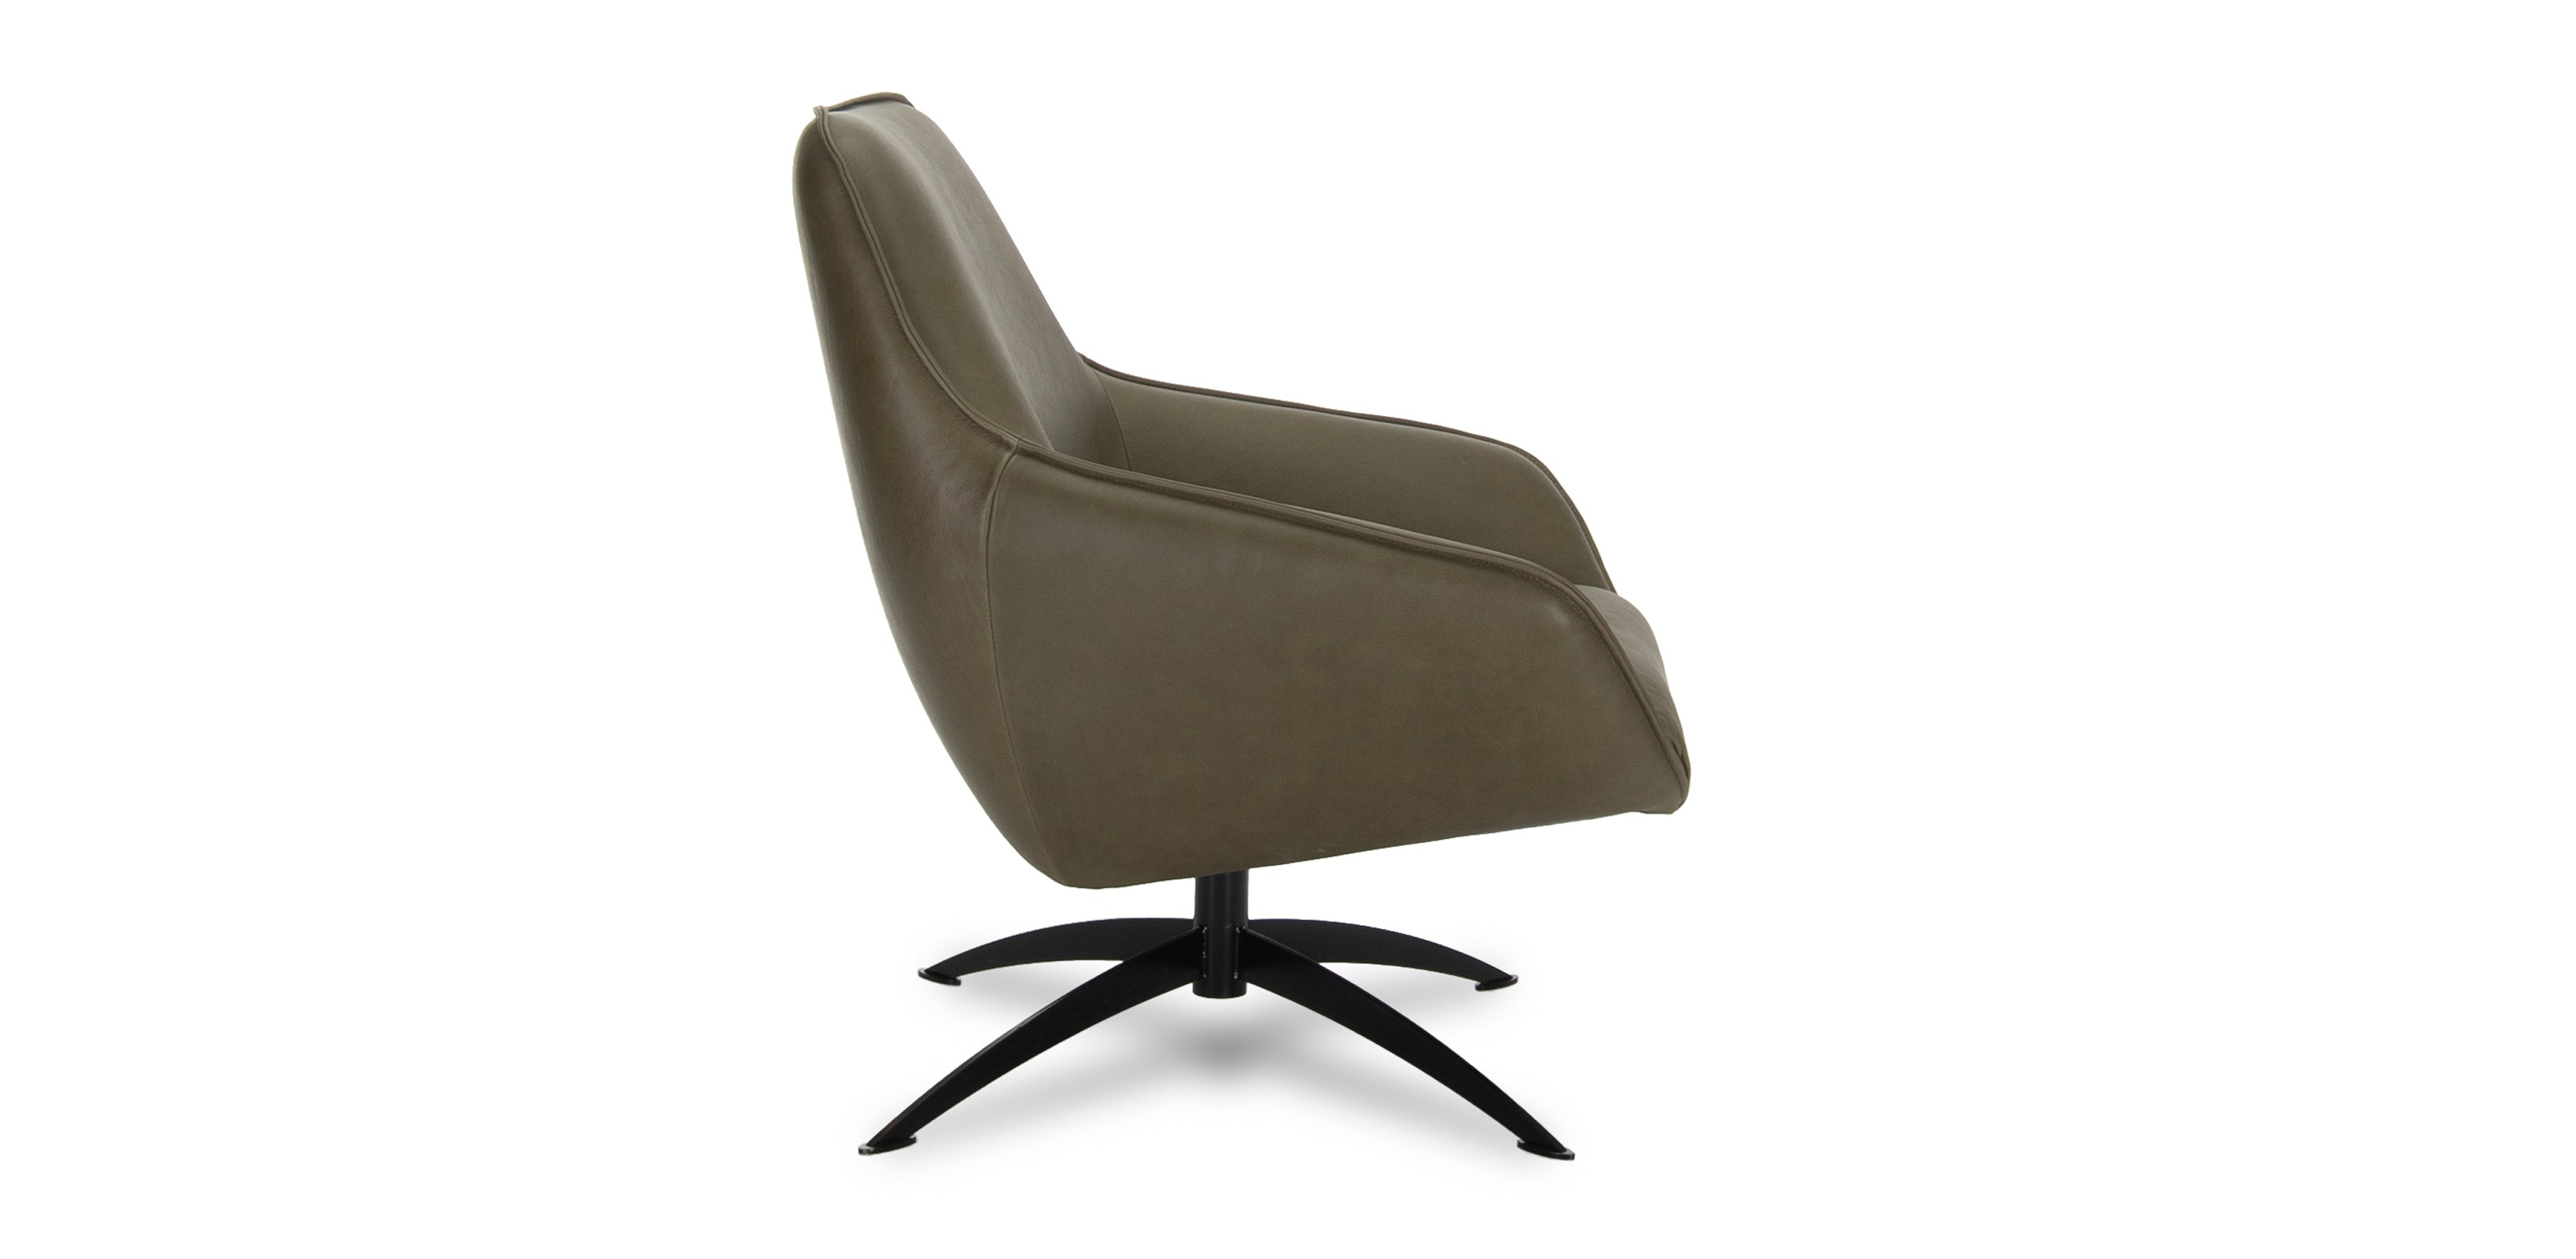 Faas fauteuil DYYK 3580x1750 leer 4